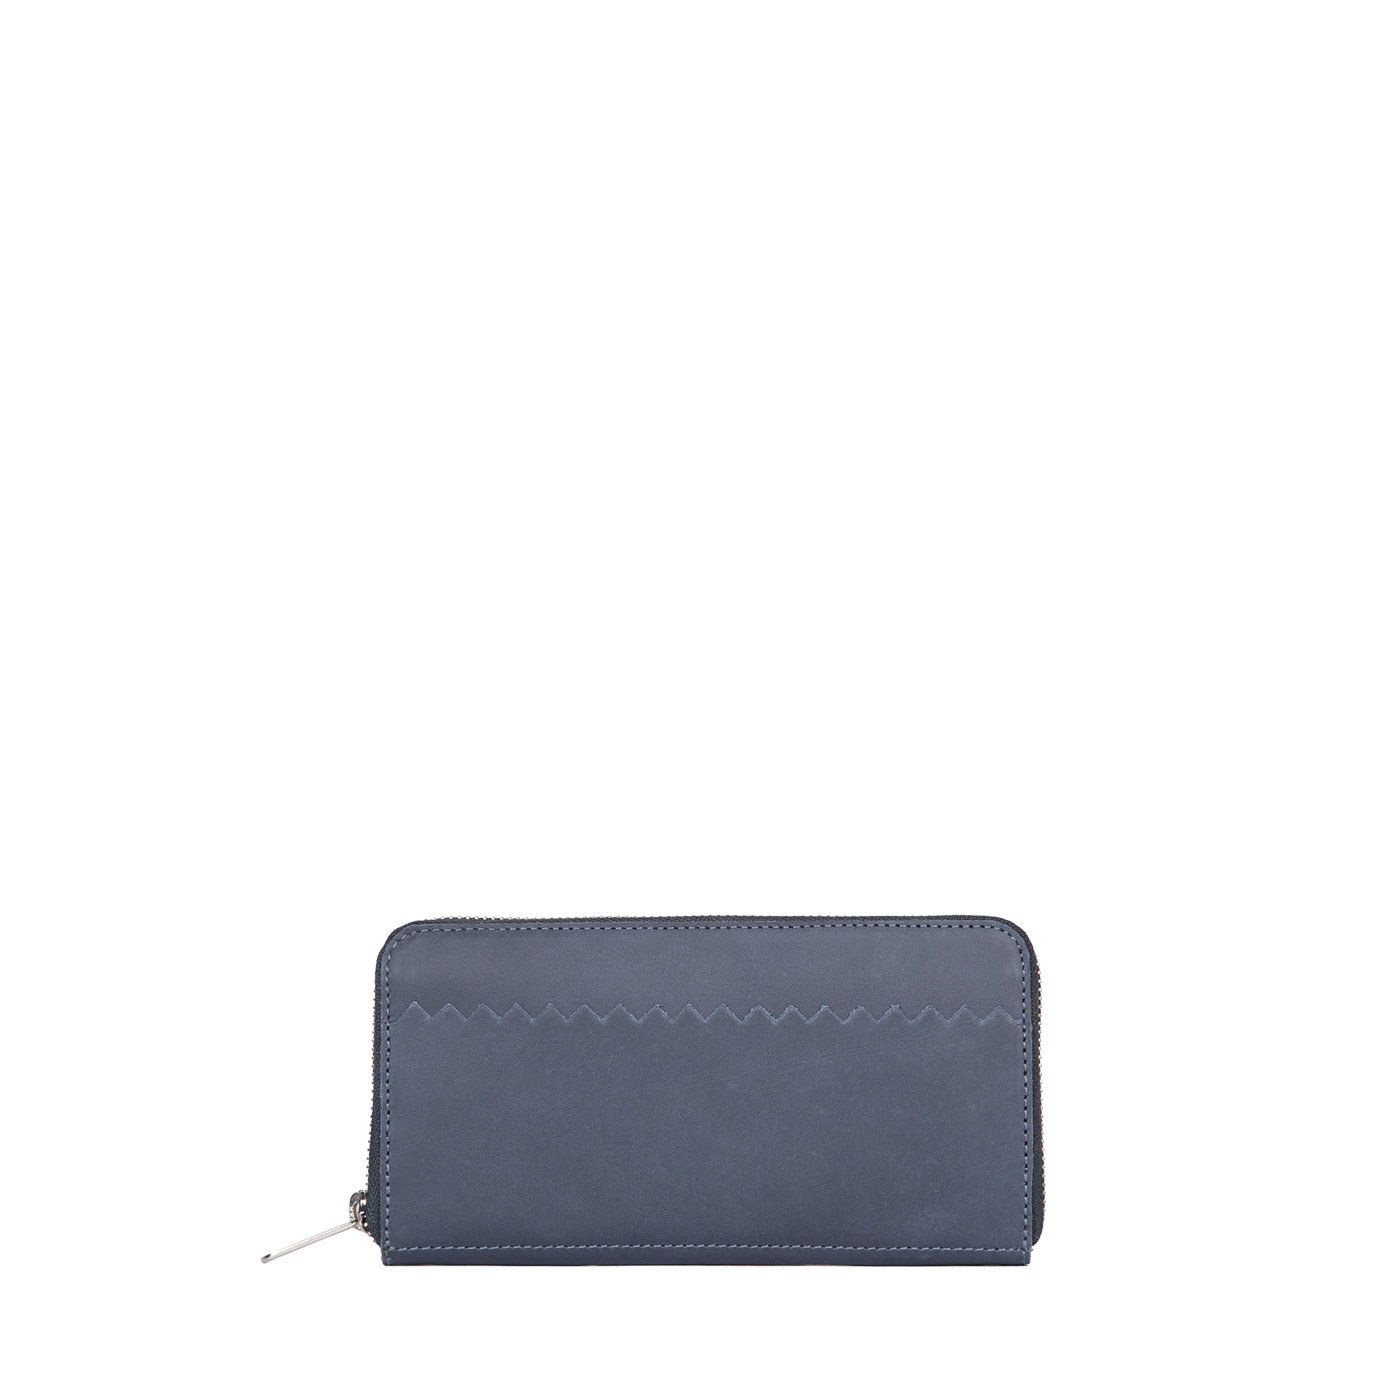 2b1c5feafea MY PAPER BAG Wallet - hunter navy blue - MYOMY